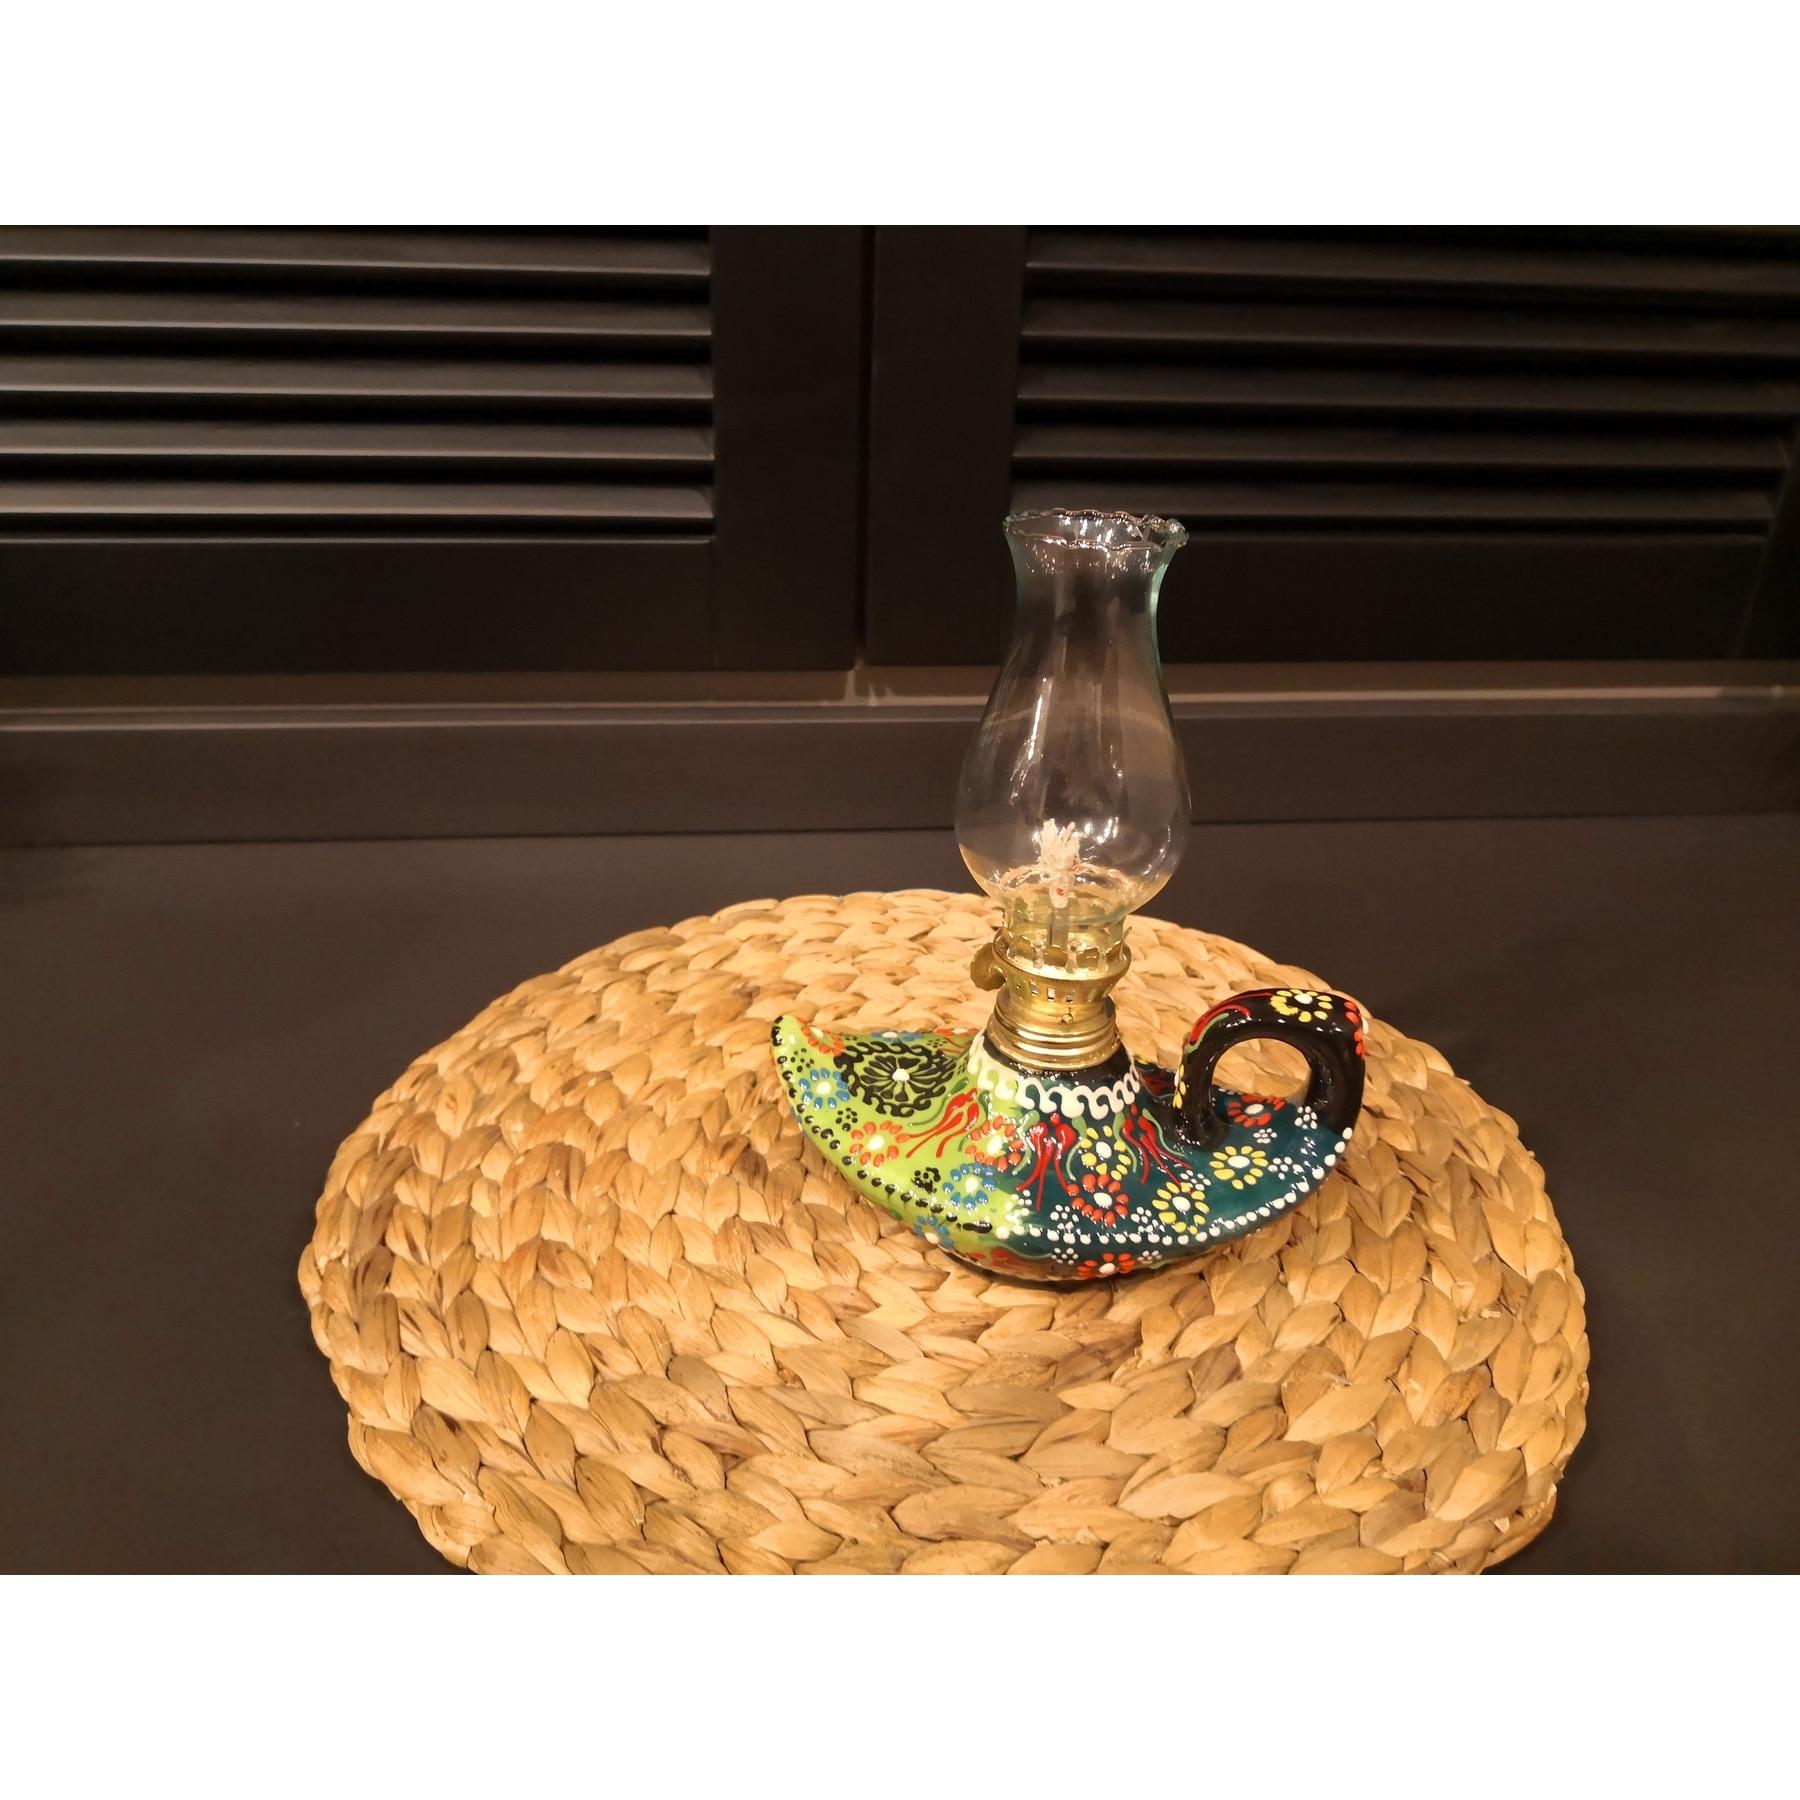 Iznik Tile Ceramic Kerosene Lamp Aladdin Magic Lamp Table Top Lamp Decor Lamp Turkish Handmade Turkish Lamp Table Top Decoratio Bottles Jars Boxes Aliexpress